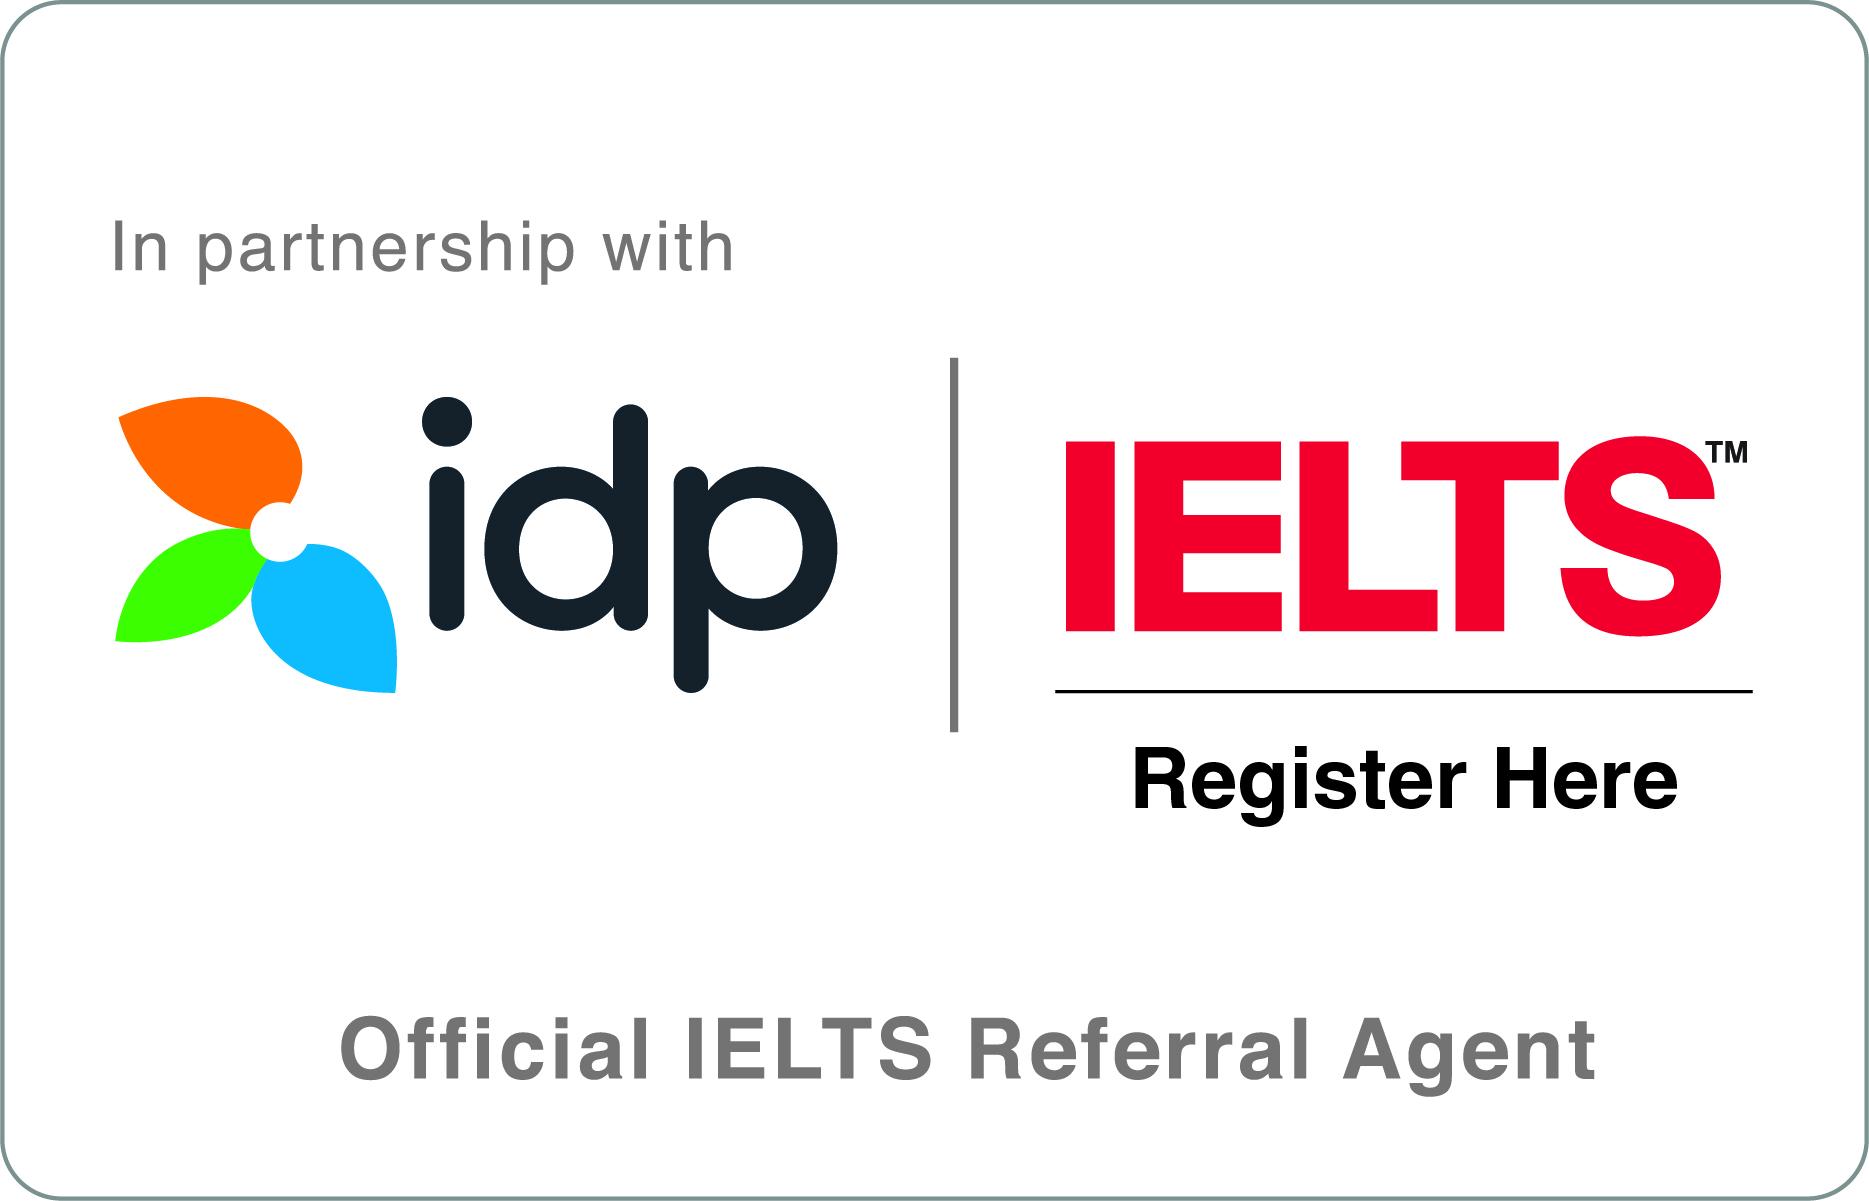 IELTS Registration